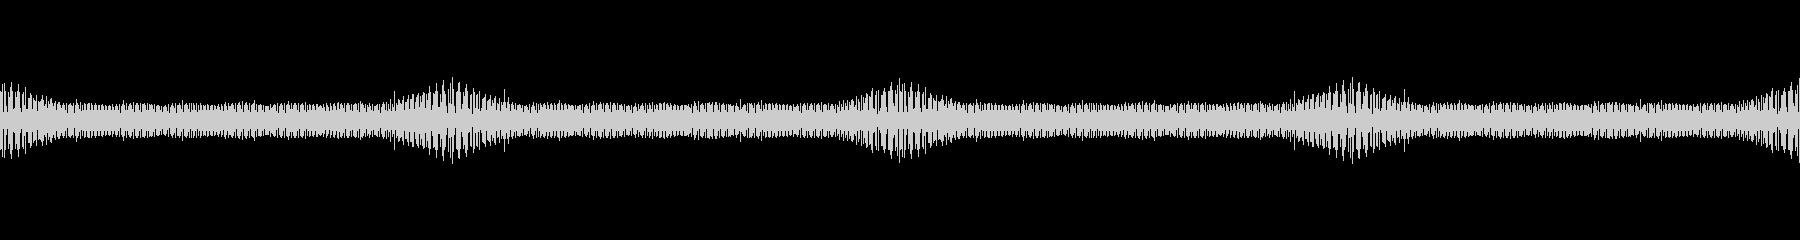 ASMR 音フェチApp用 ノイズ 7の未再生の波形